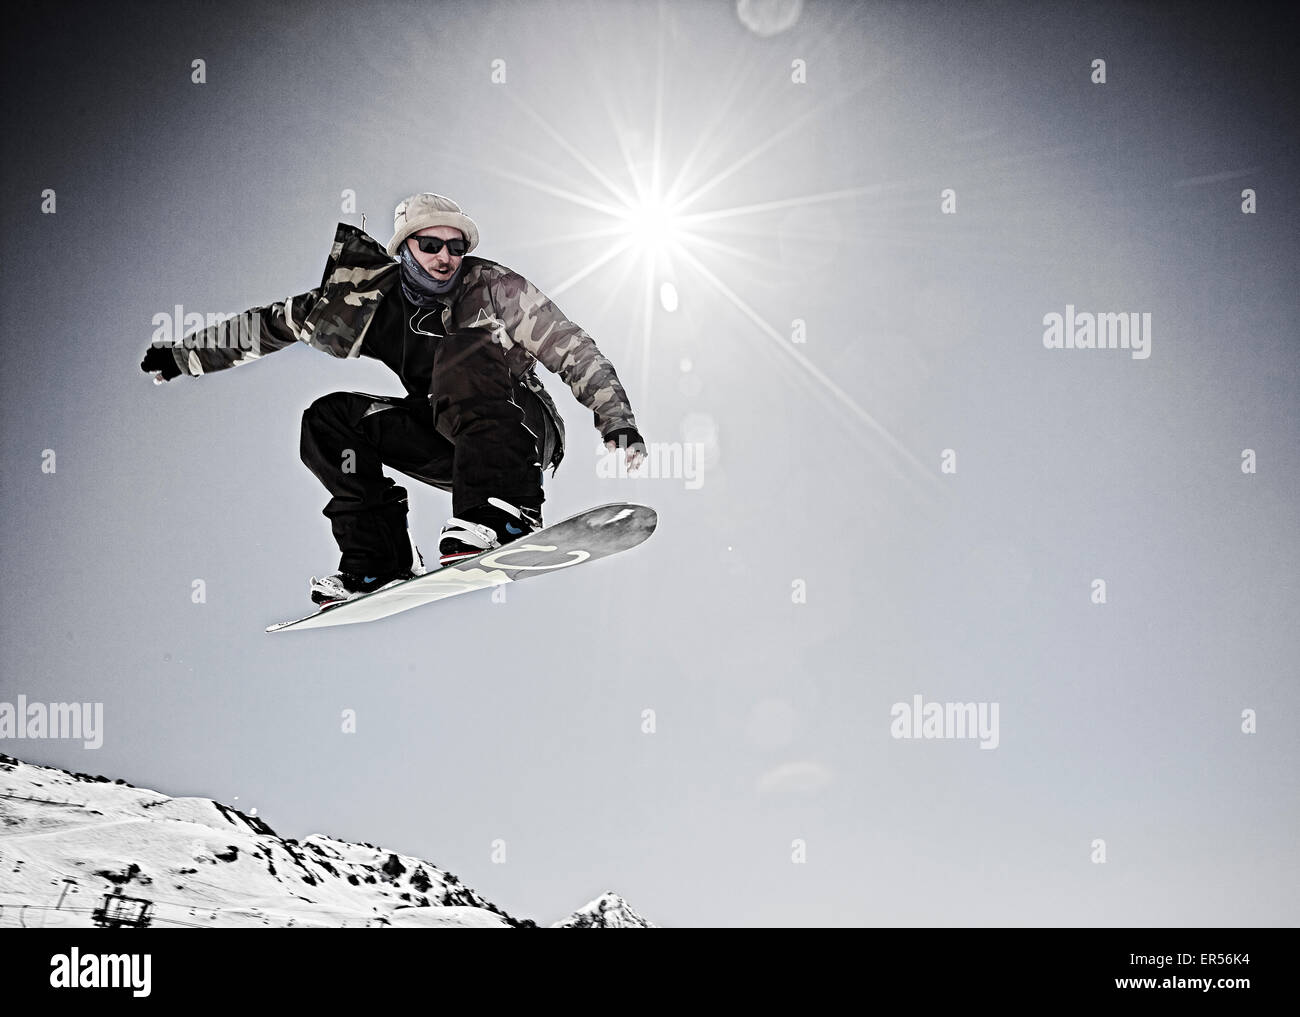 Snowboarder Les Arcs, The John Doe Event - Stock Image